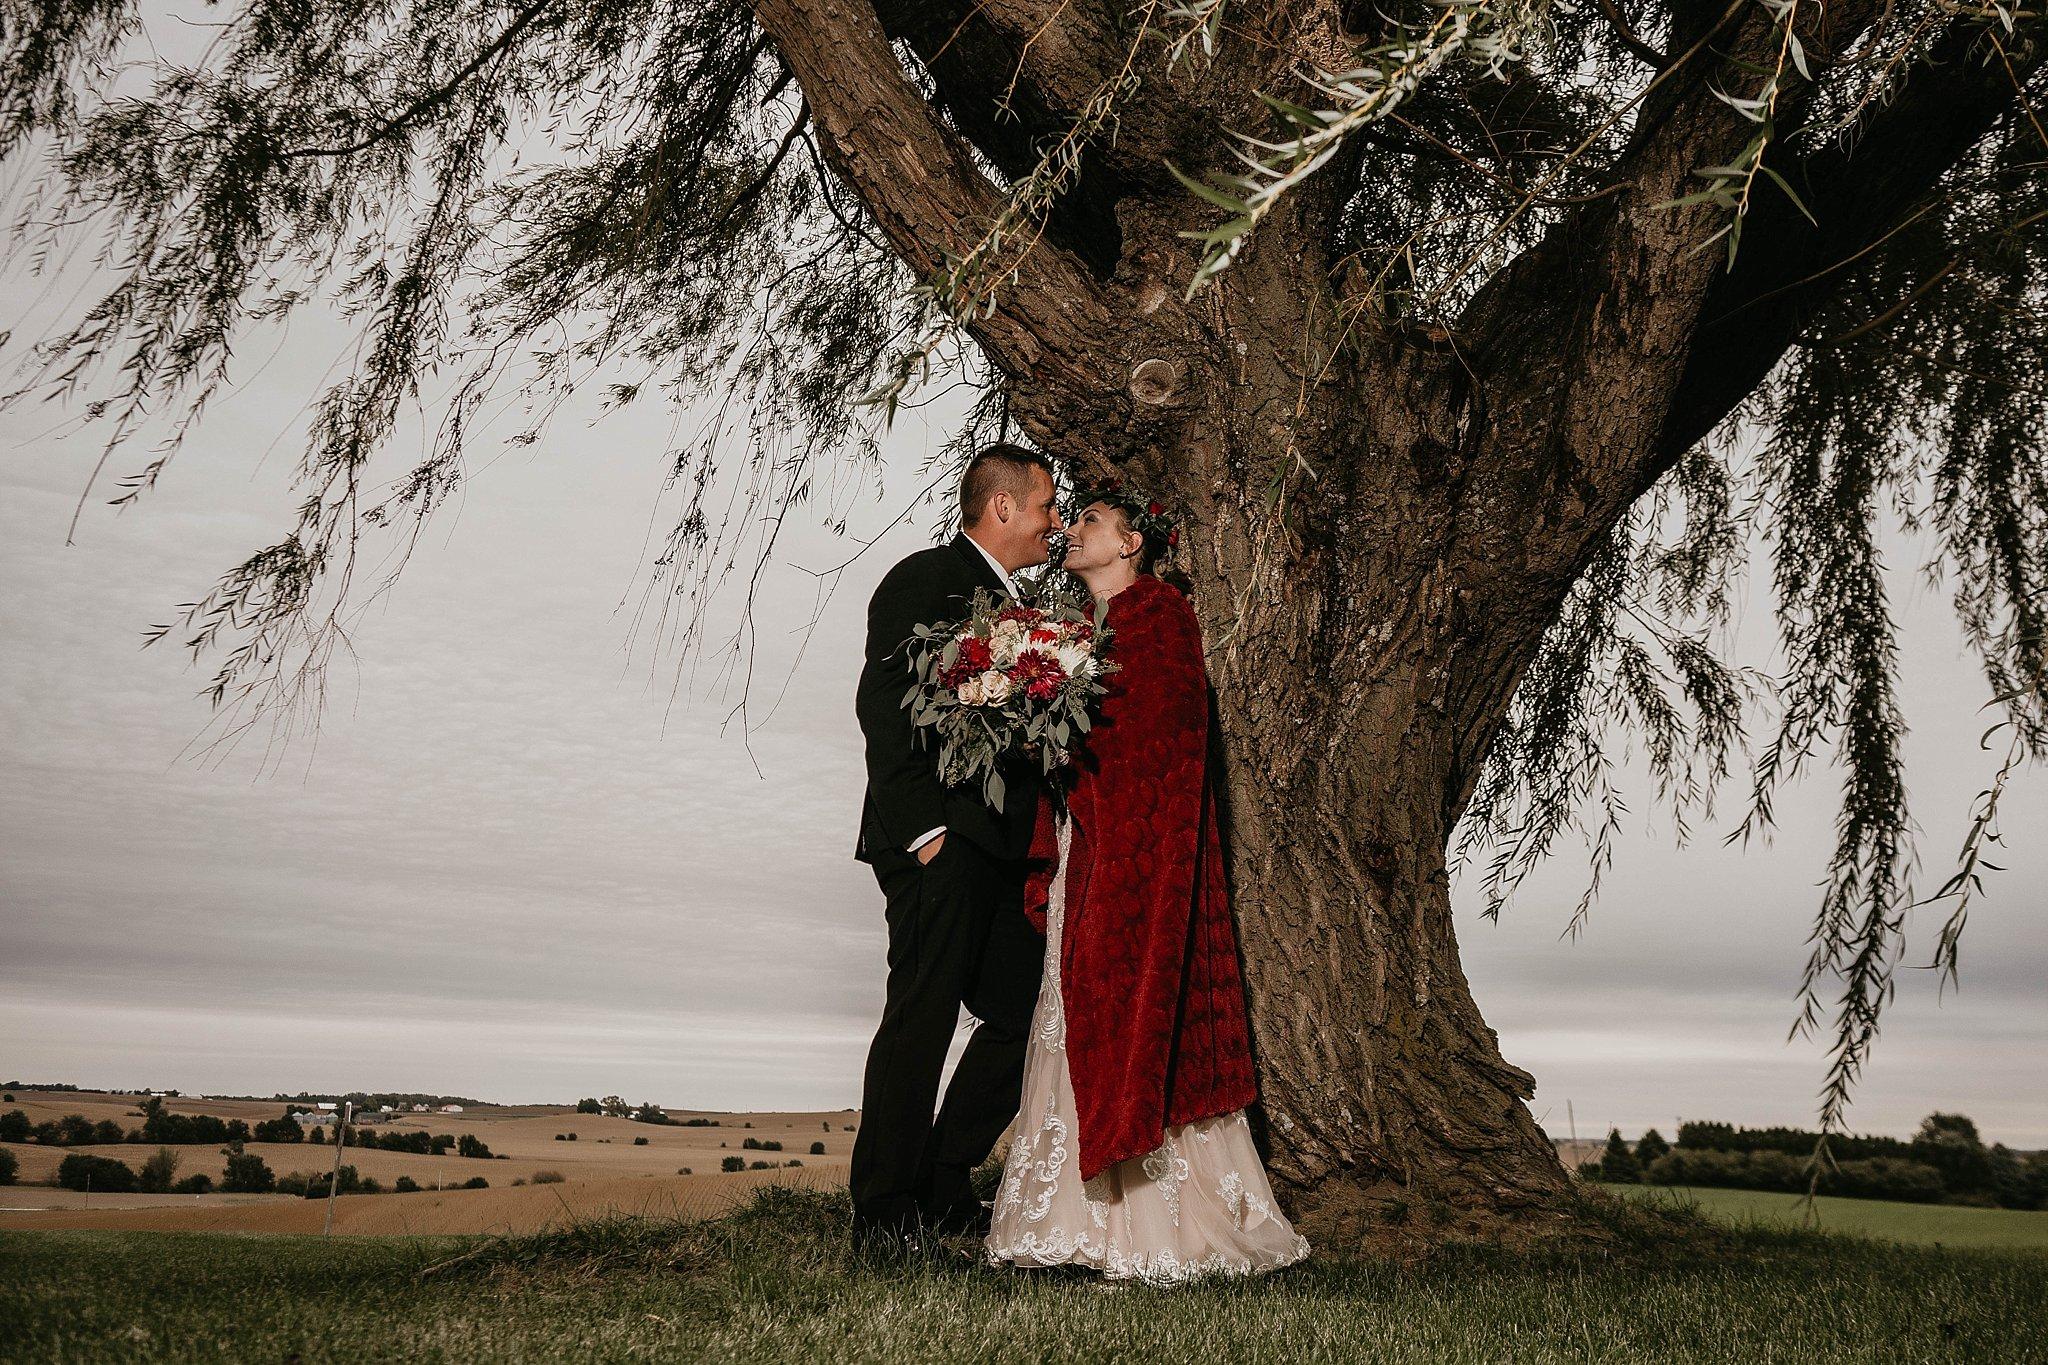 DesMoines-Iowa-Wedding-Photography-Destination-Photographer_0149.jpg